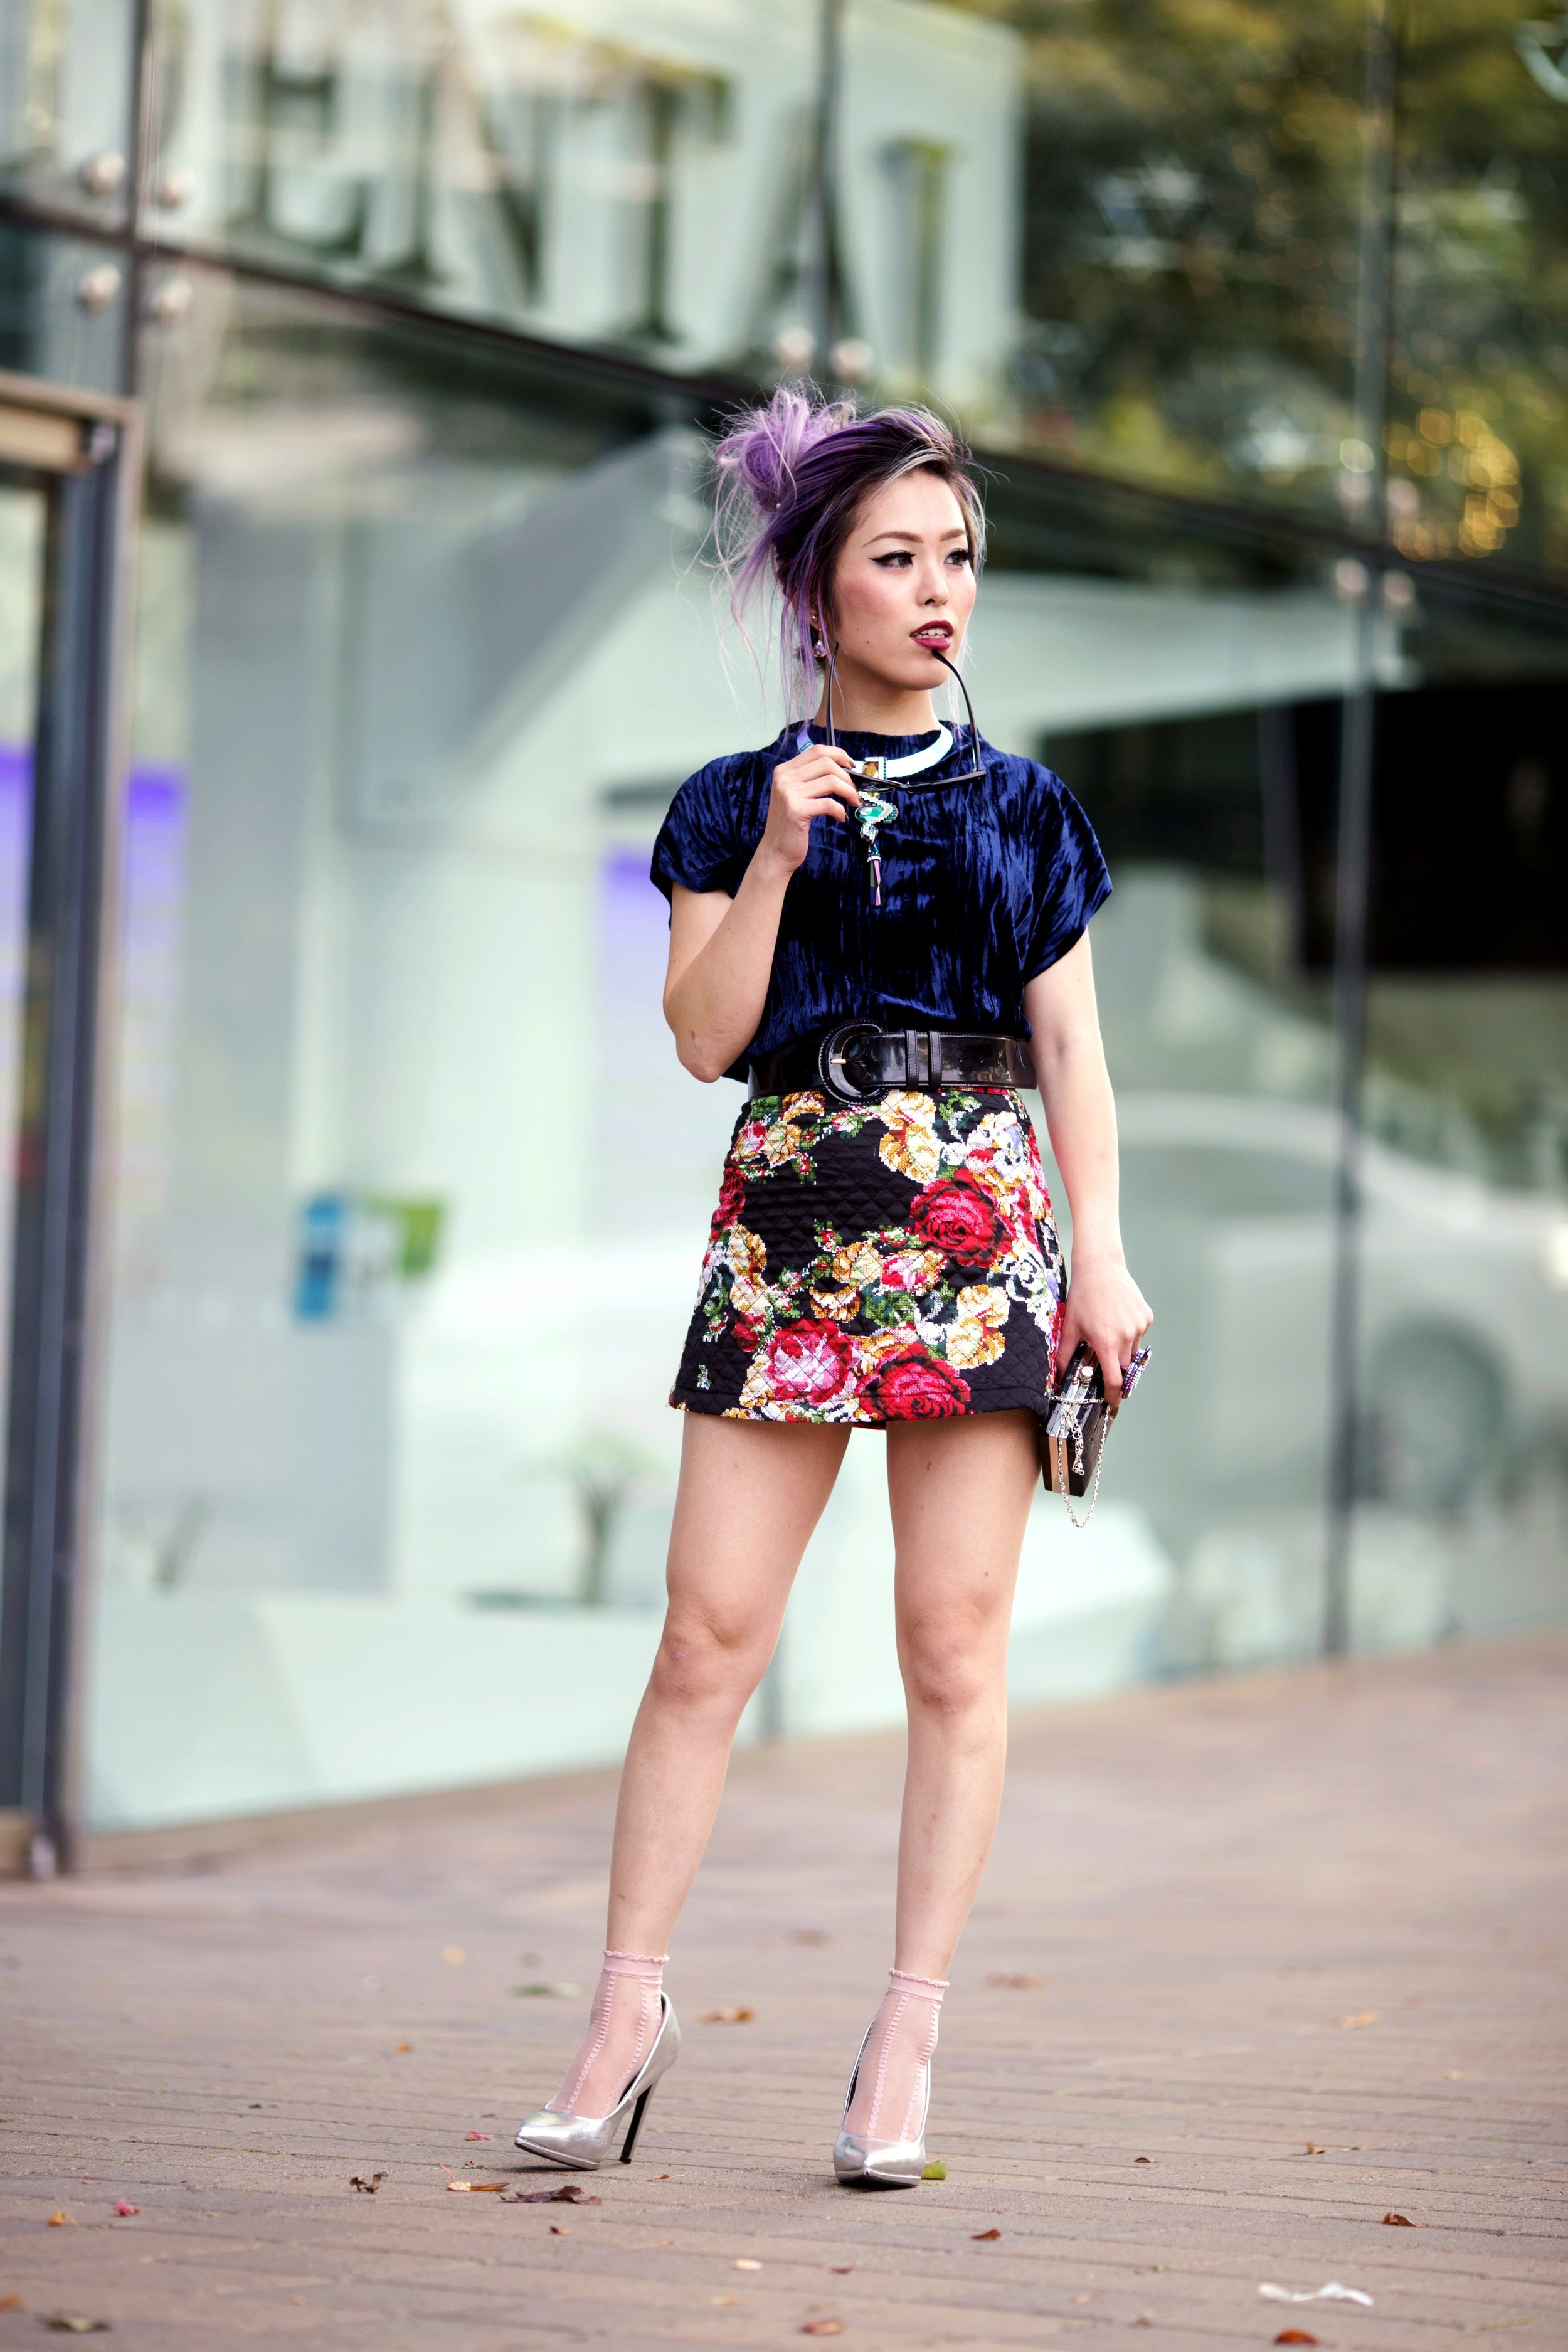 ZARA Blue Velvet Top_Forever 21 Floral Print Mini Skirt_Mango Patent Belt_Kate Spade Sheer Ankle Socks_Qupid Silver Pumps_Aldo Cateye Sunglasses_Swarovski Fluorescent Necklace & Fluorescent Ring_Aika's Love Closet_Seattle Fashion Blogger_Japanese_Lavender Hair_Mermaid Hair 6